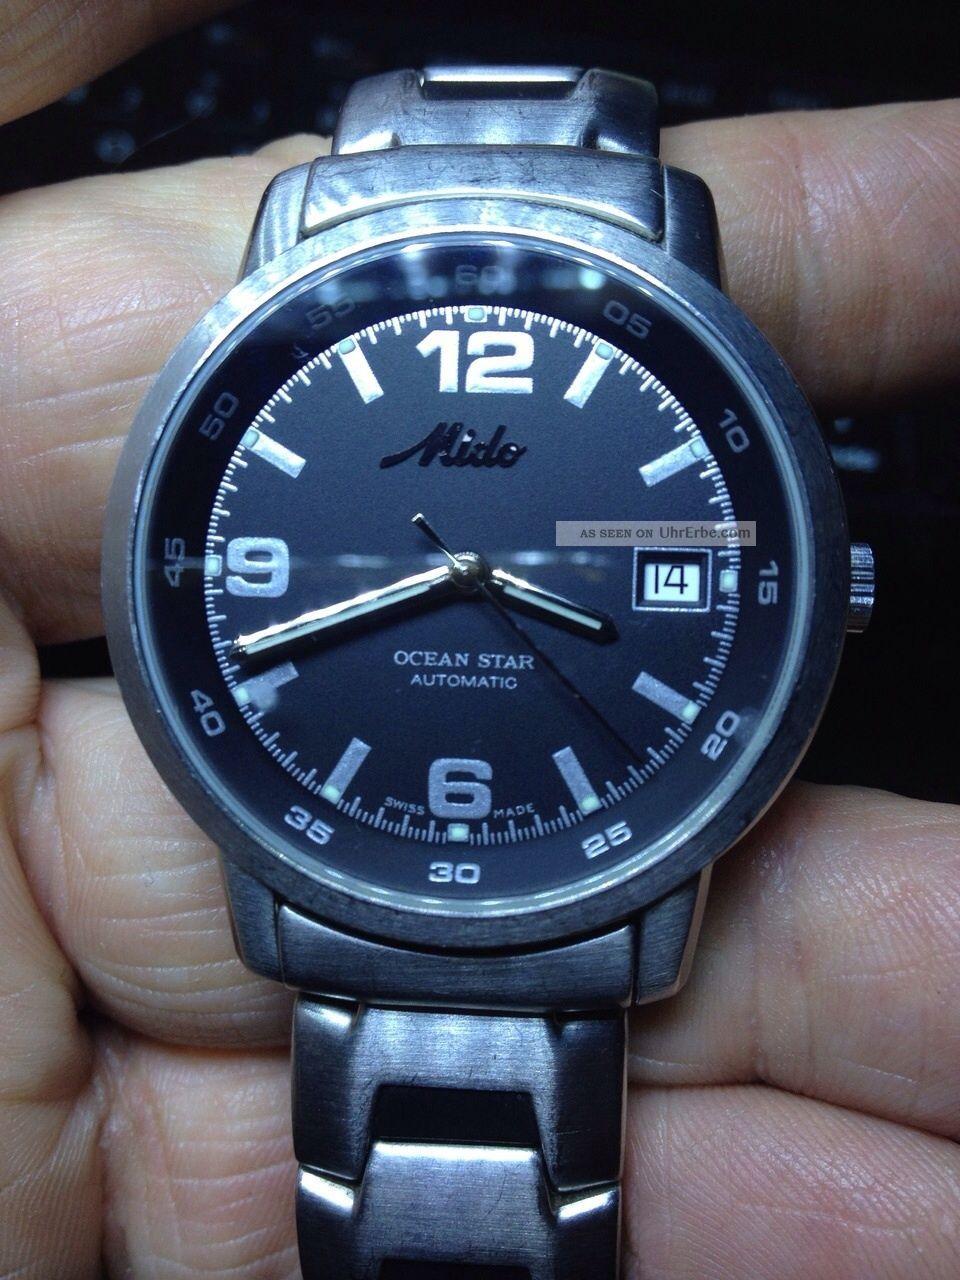 Armbanduhr Mido Ocean Star (8720) Armbanduhren Bild